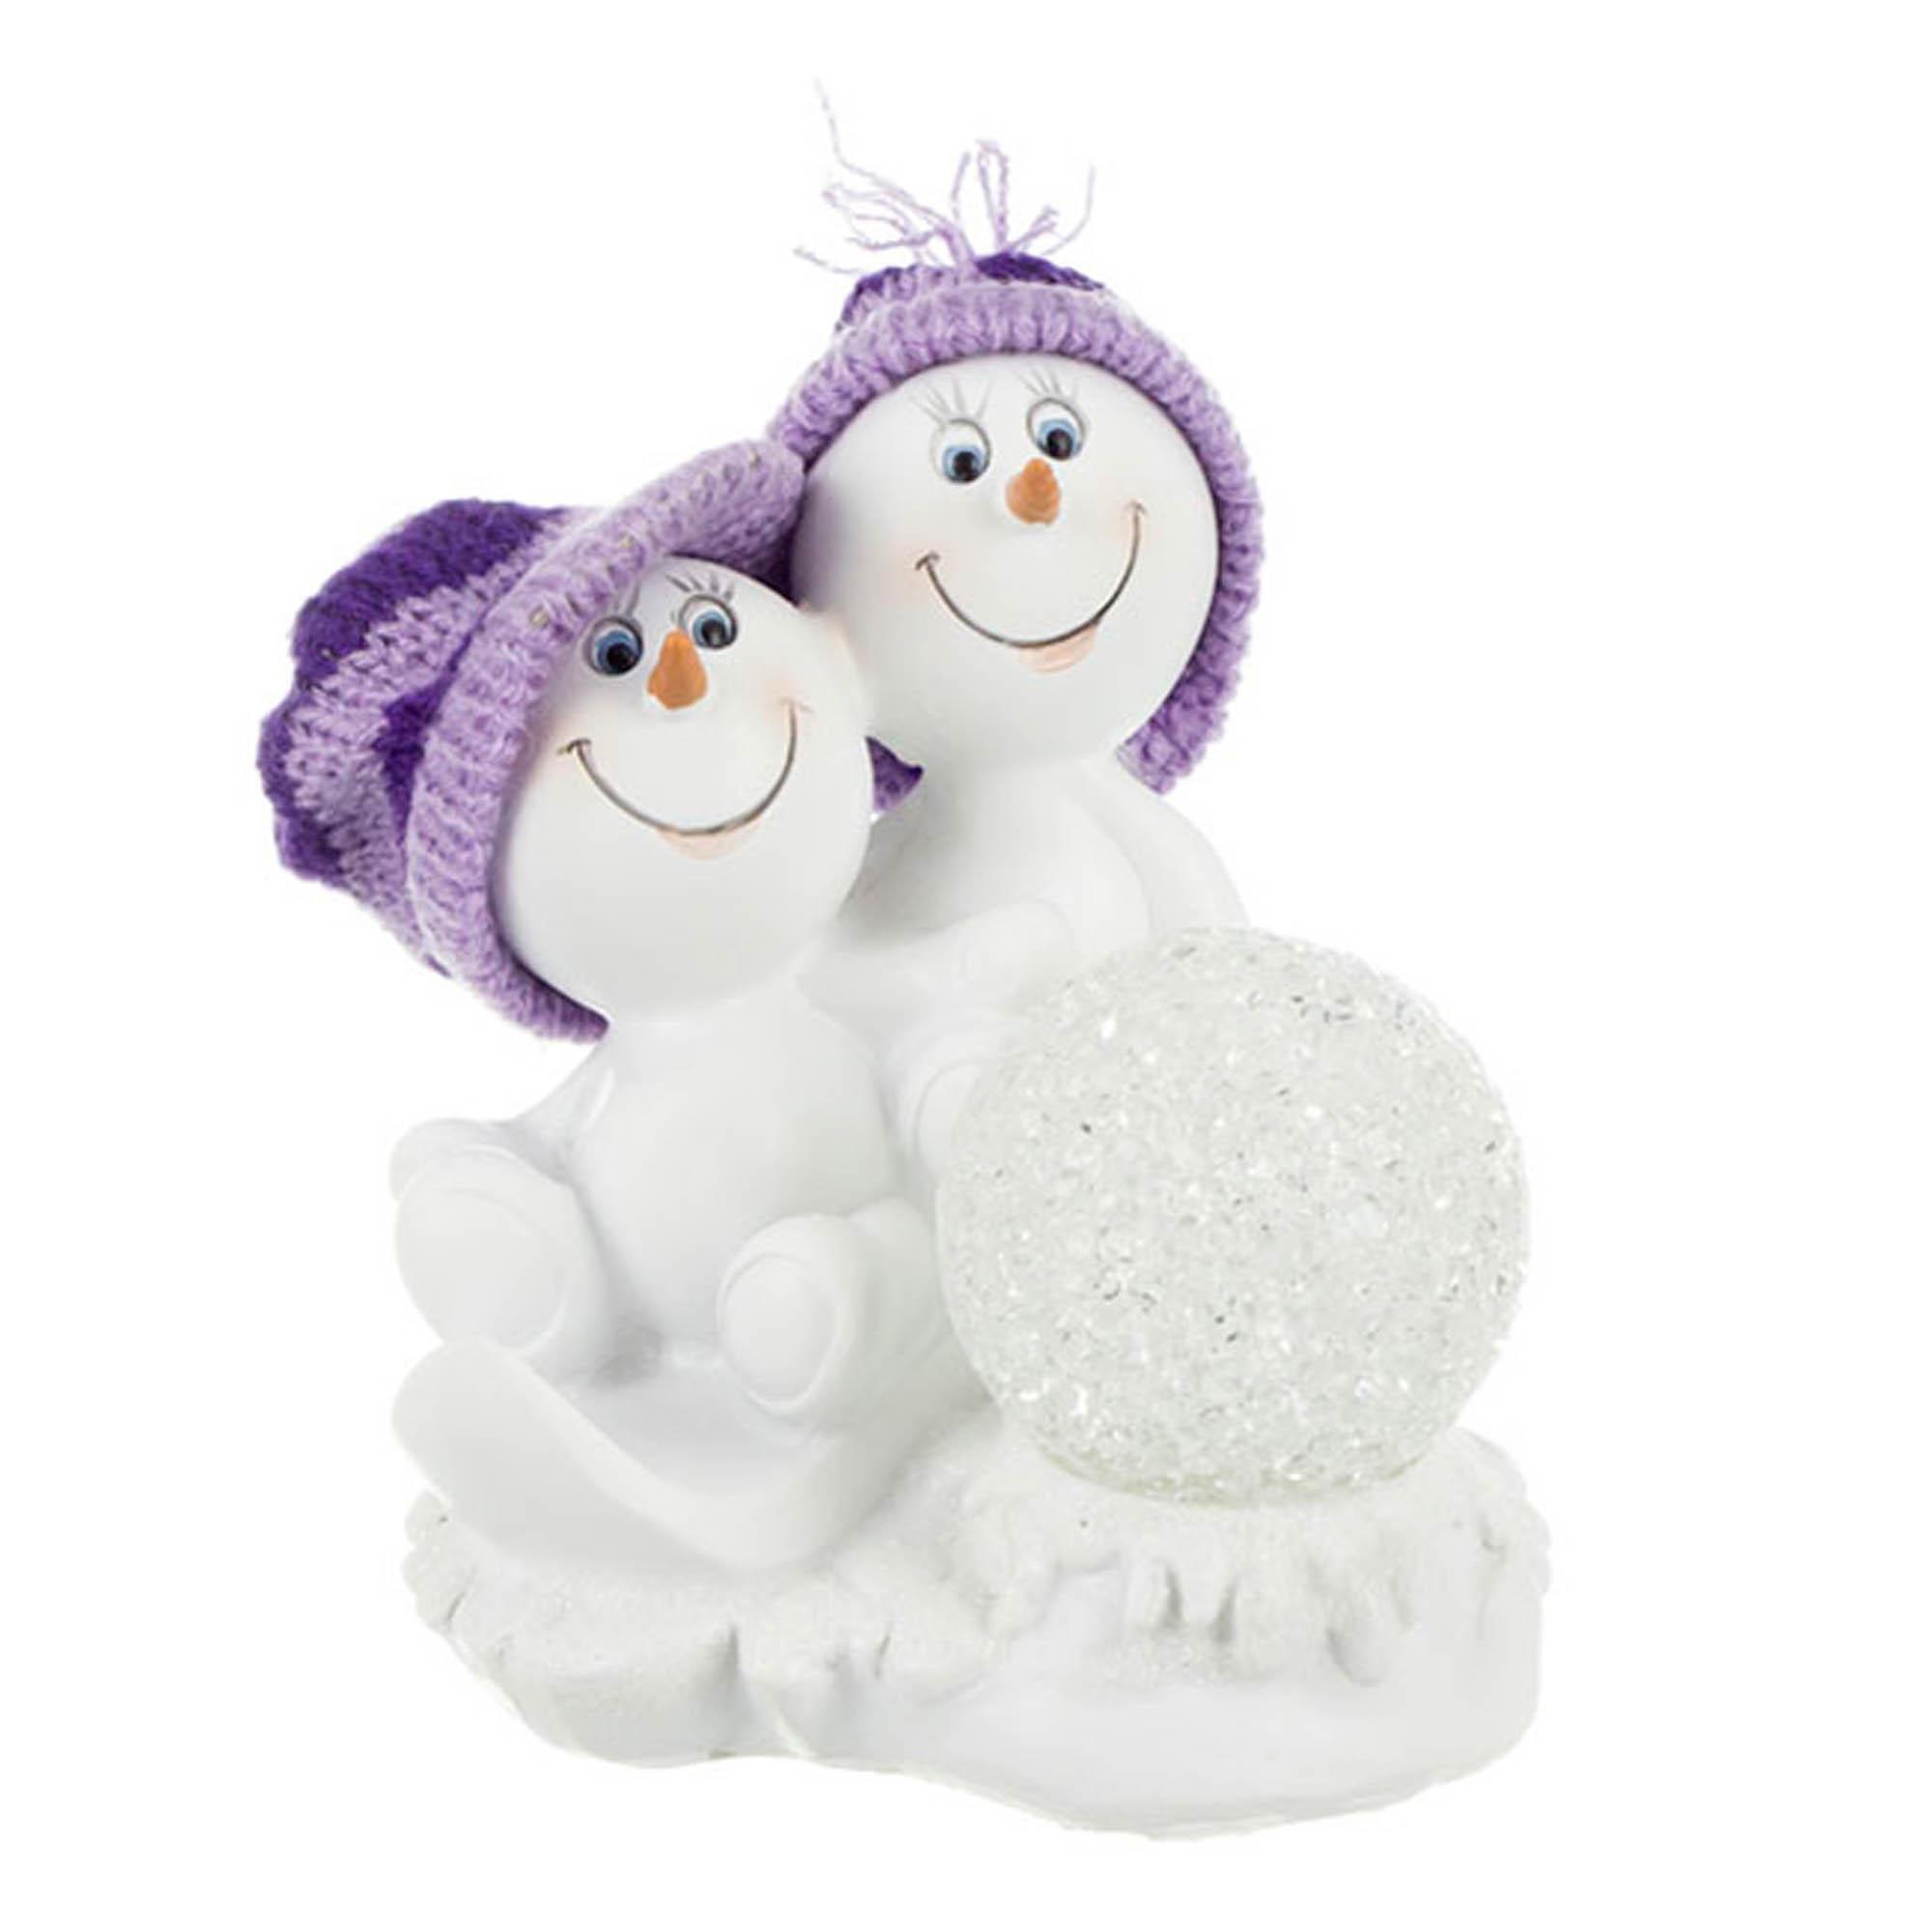 {} Lefard Интерьерная игрушка Снеговички (10х11х12 см) lefard интерьерная игрушка jan 5х6х13 см